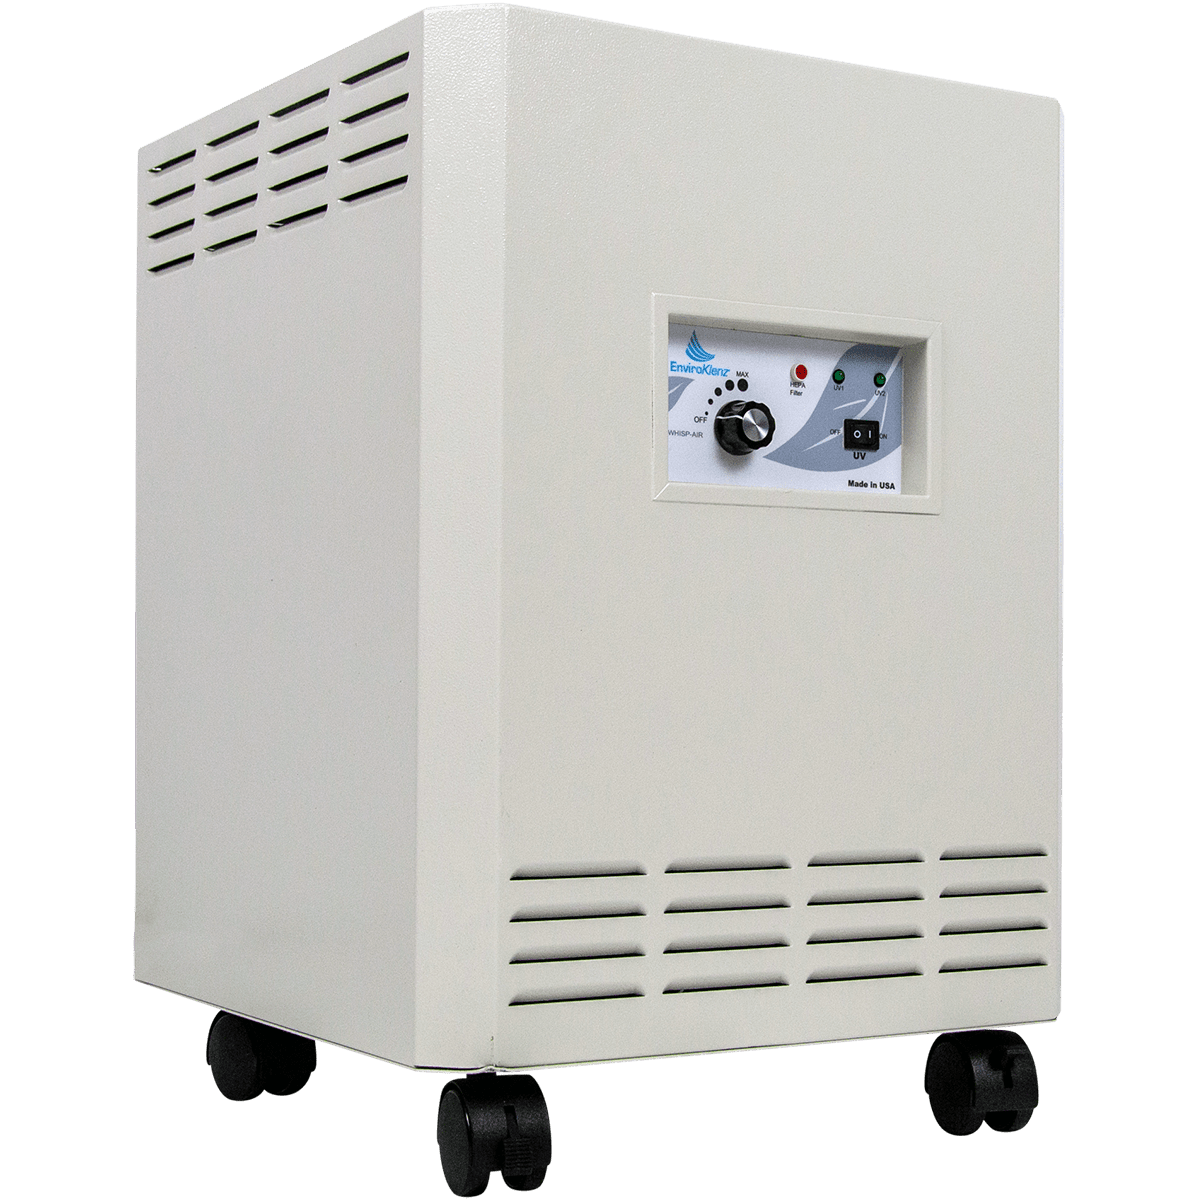 Enviroklenz UV-C Air Purifier